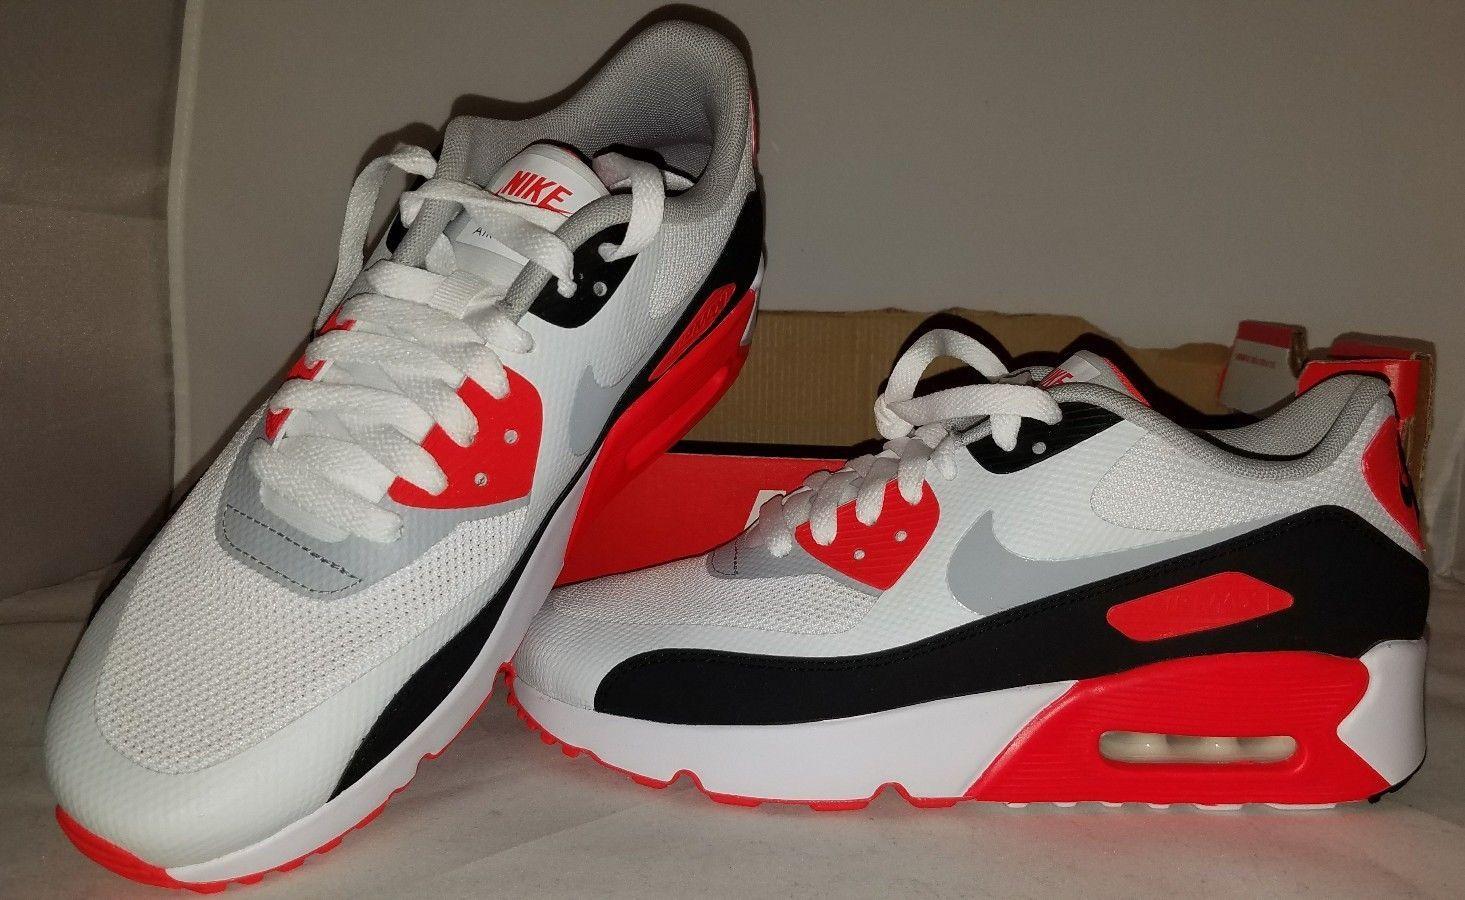 best sneakers bcd1f 7de8d Nike Air Max 90 Ultra 2.0 GS 869950 White Grey Crimson Men s Boys Size 7  Fast